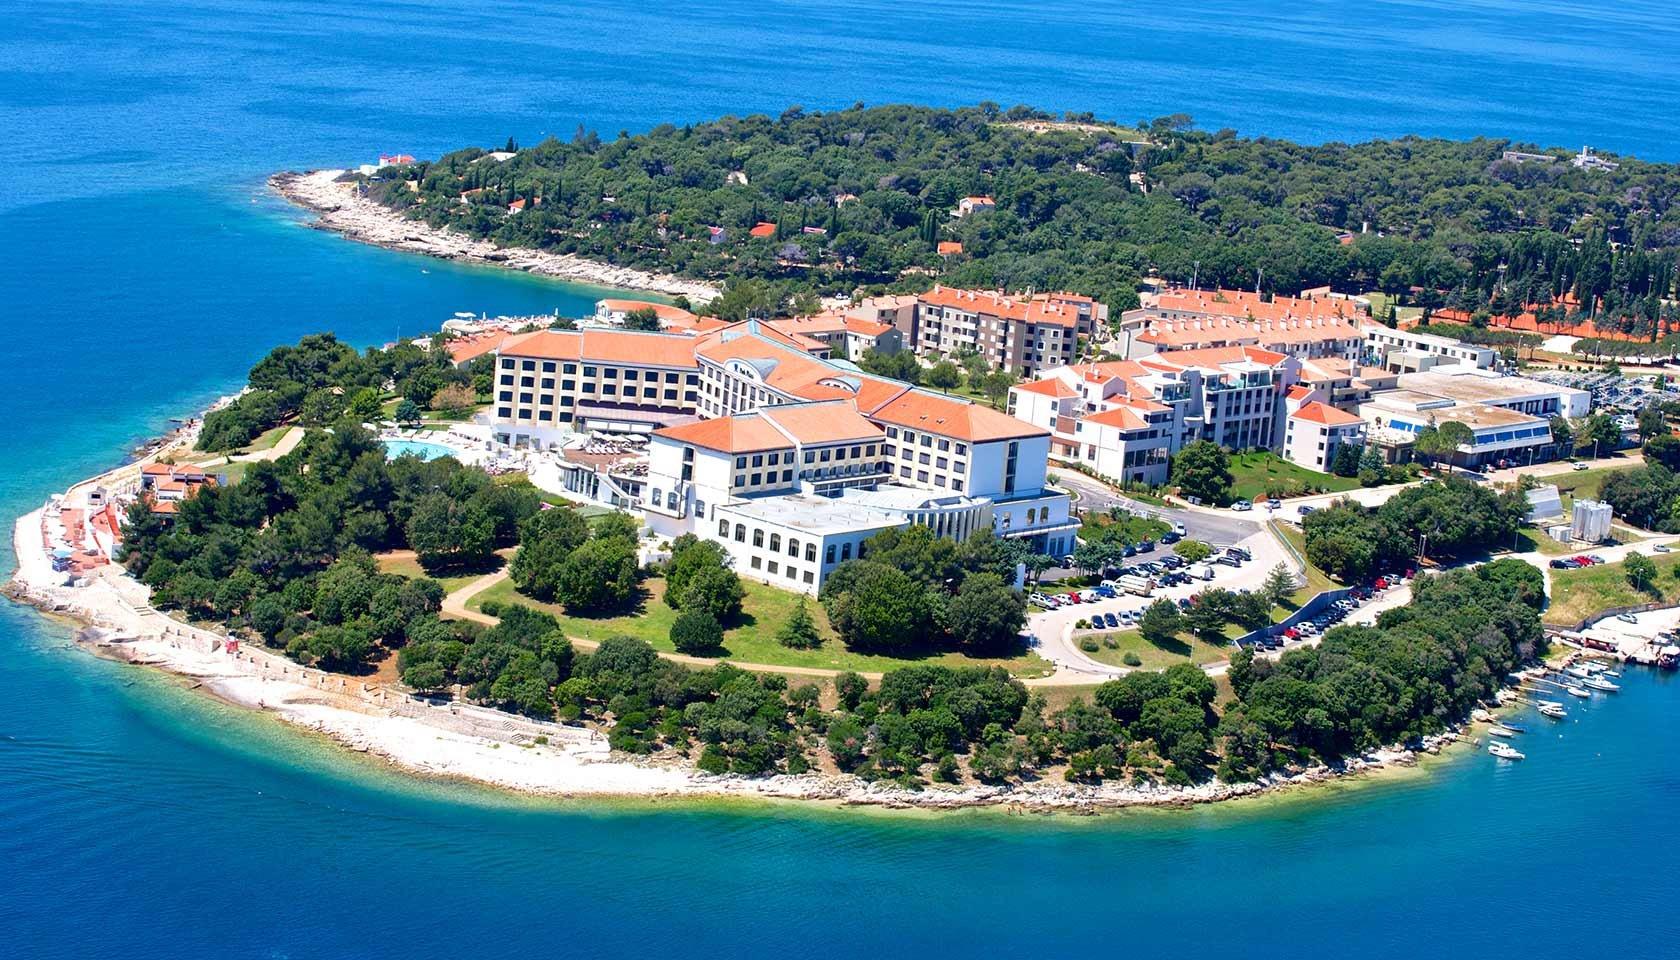 Hotel Resort Croatia